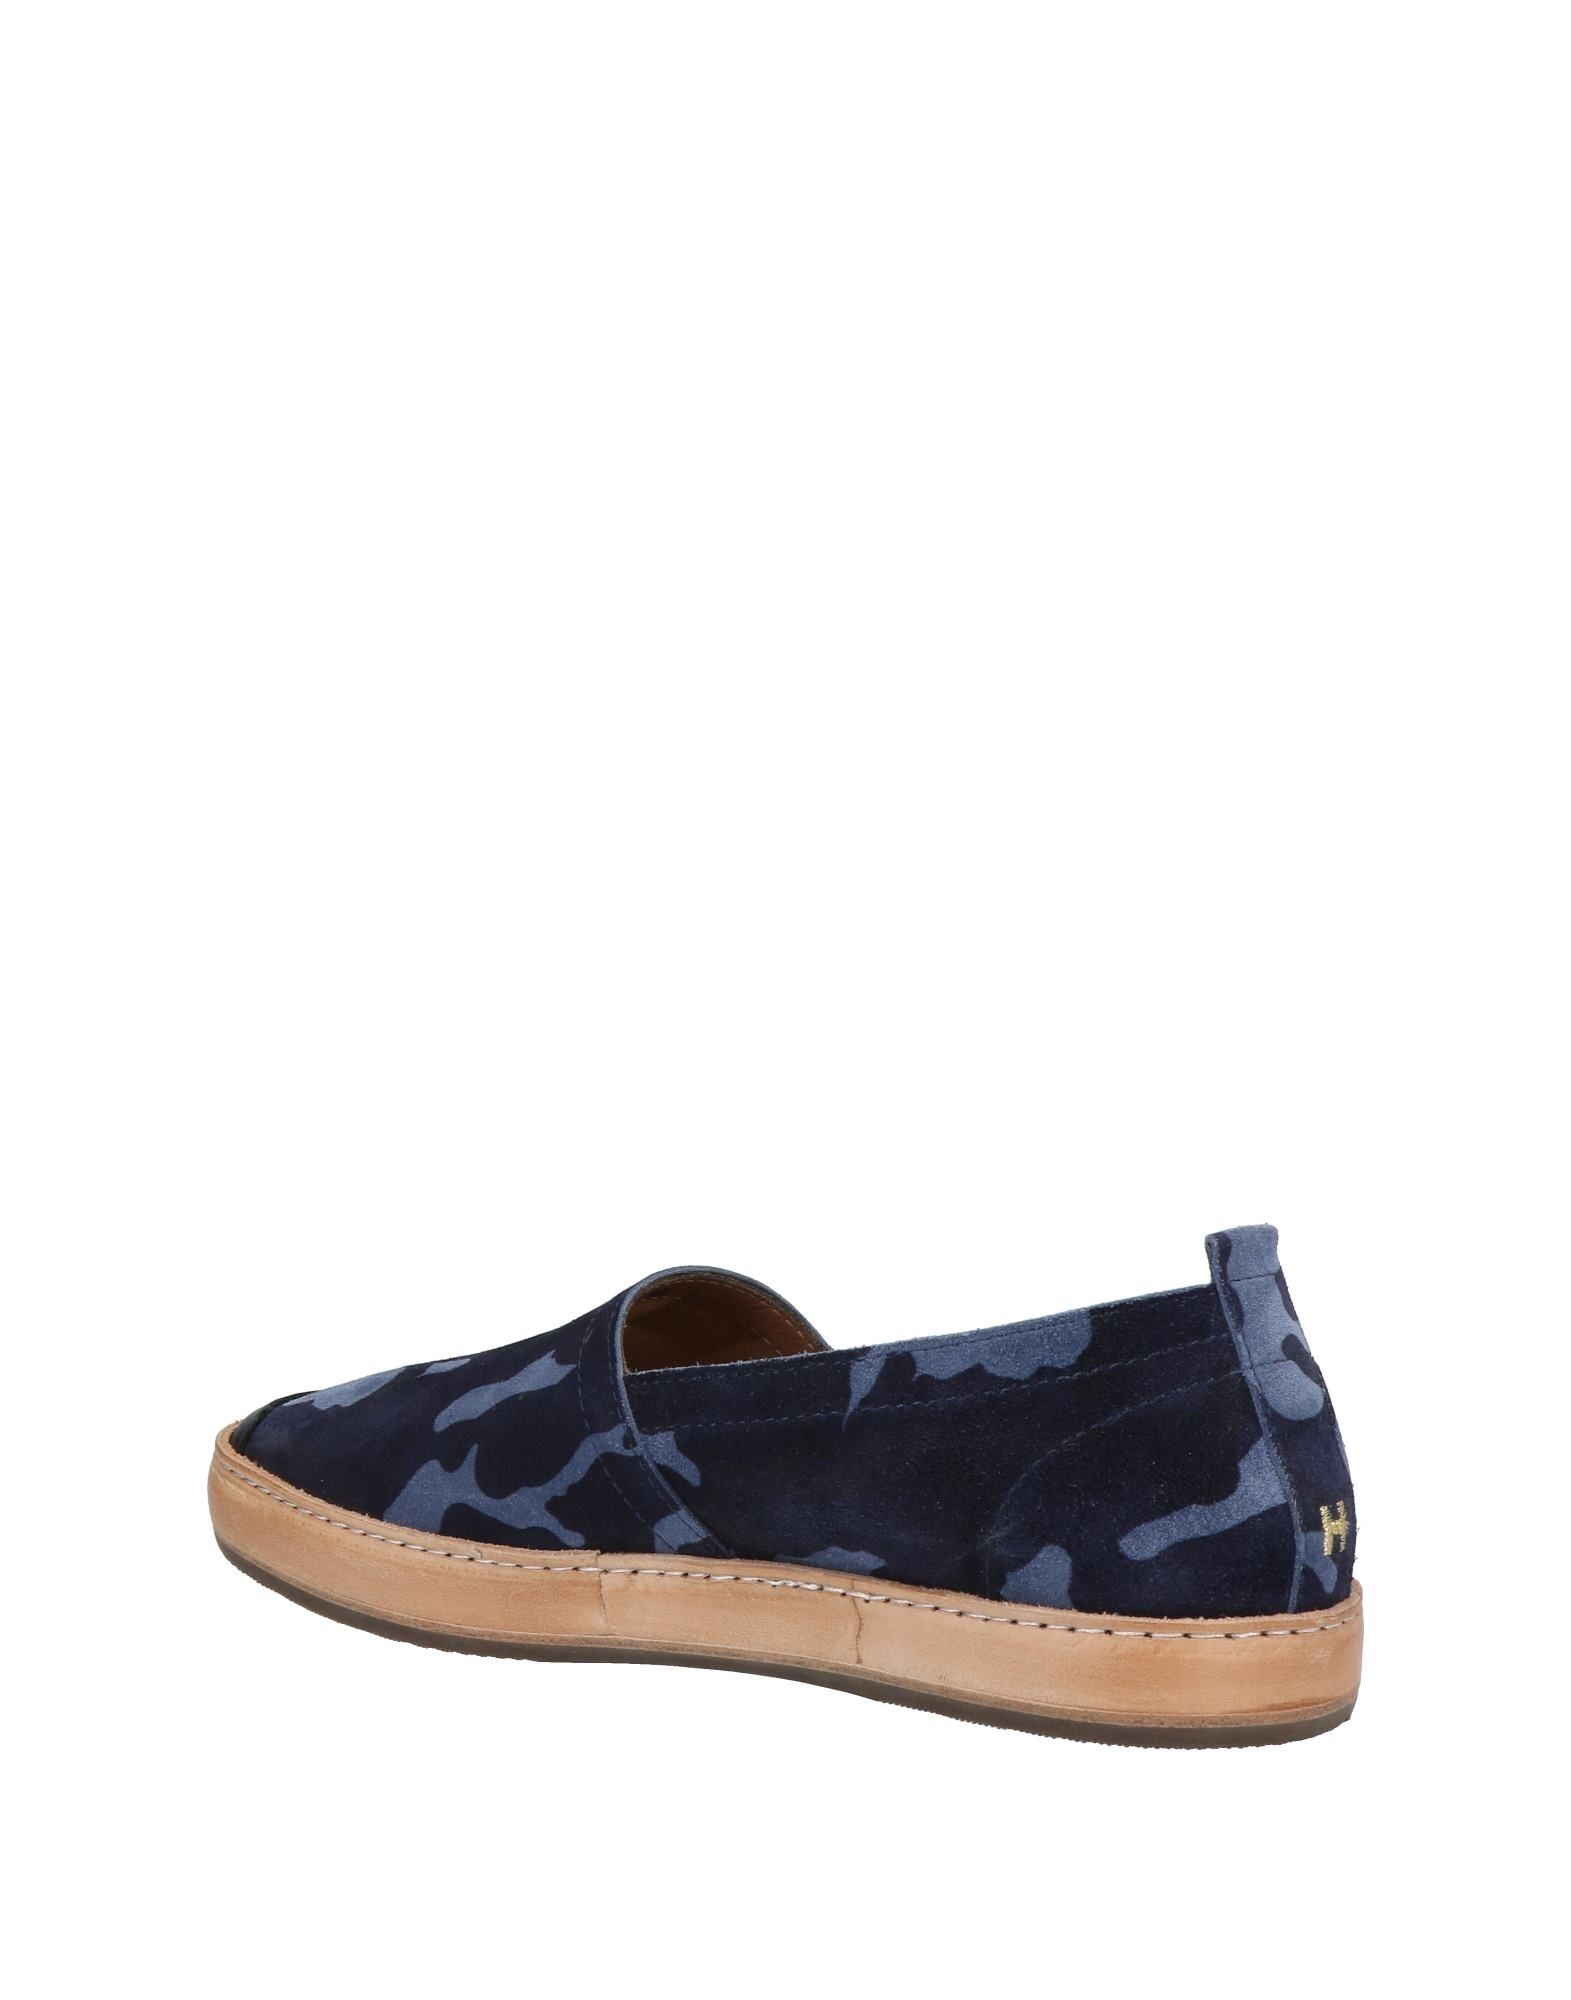 Henderson Gute Sneakers Herren  11452253JM Gute Henderson Qualität beliebte Schuhe e48490